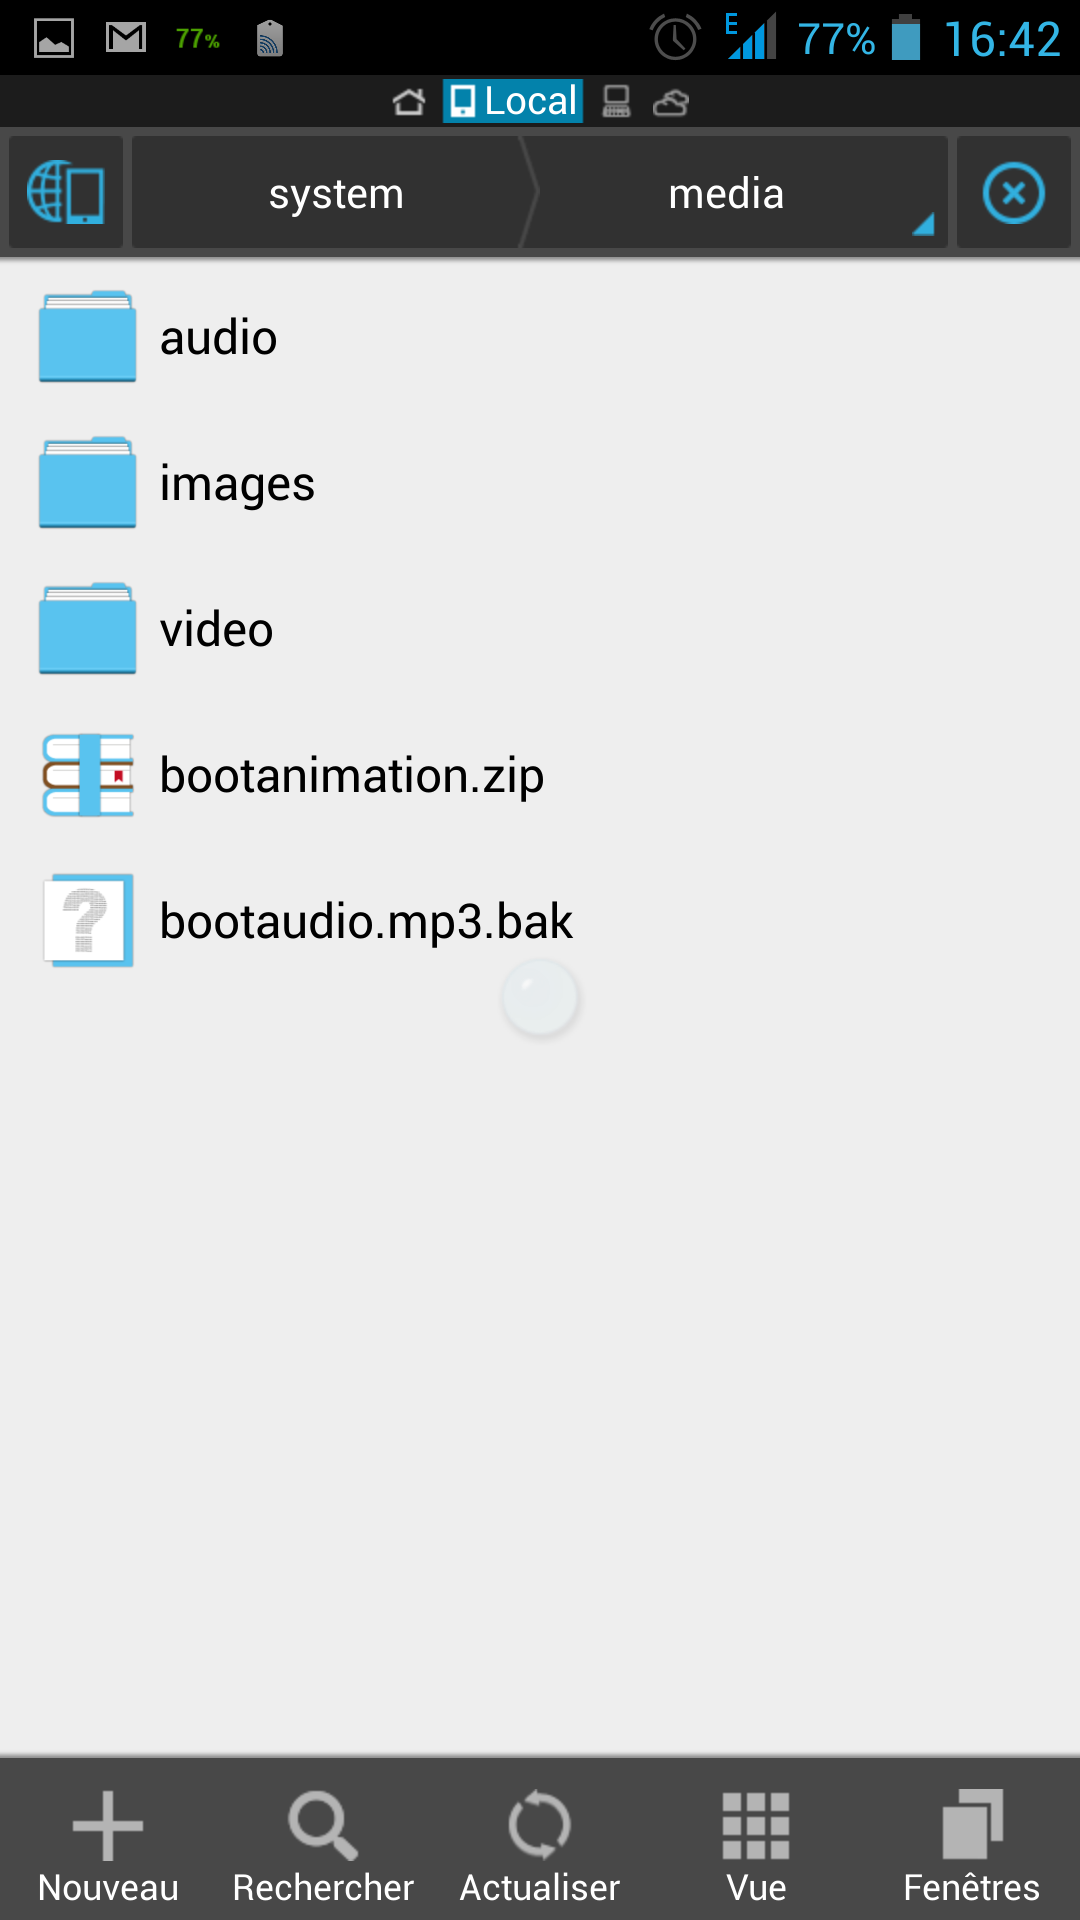 Screenshot_2014-02-12-16-42-21